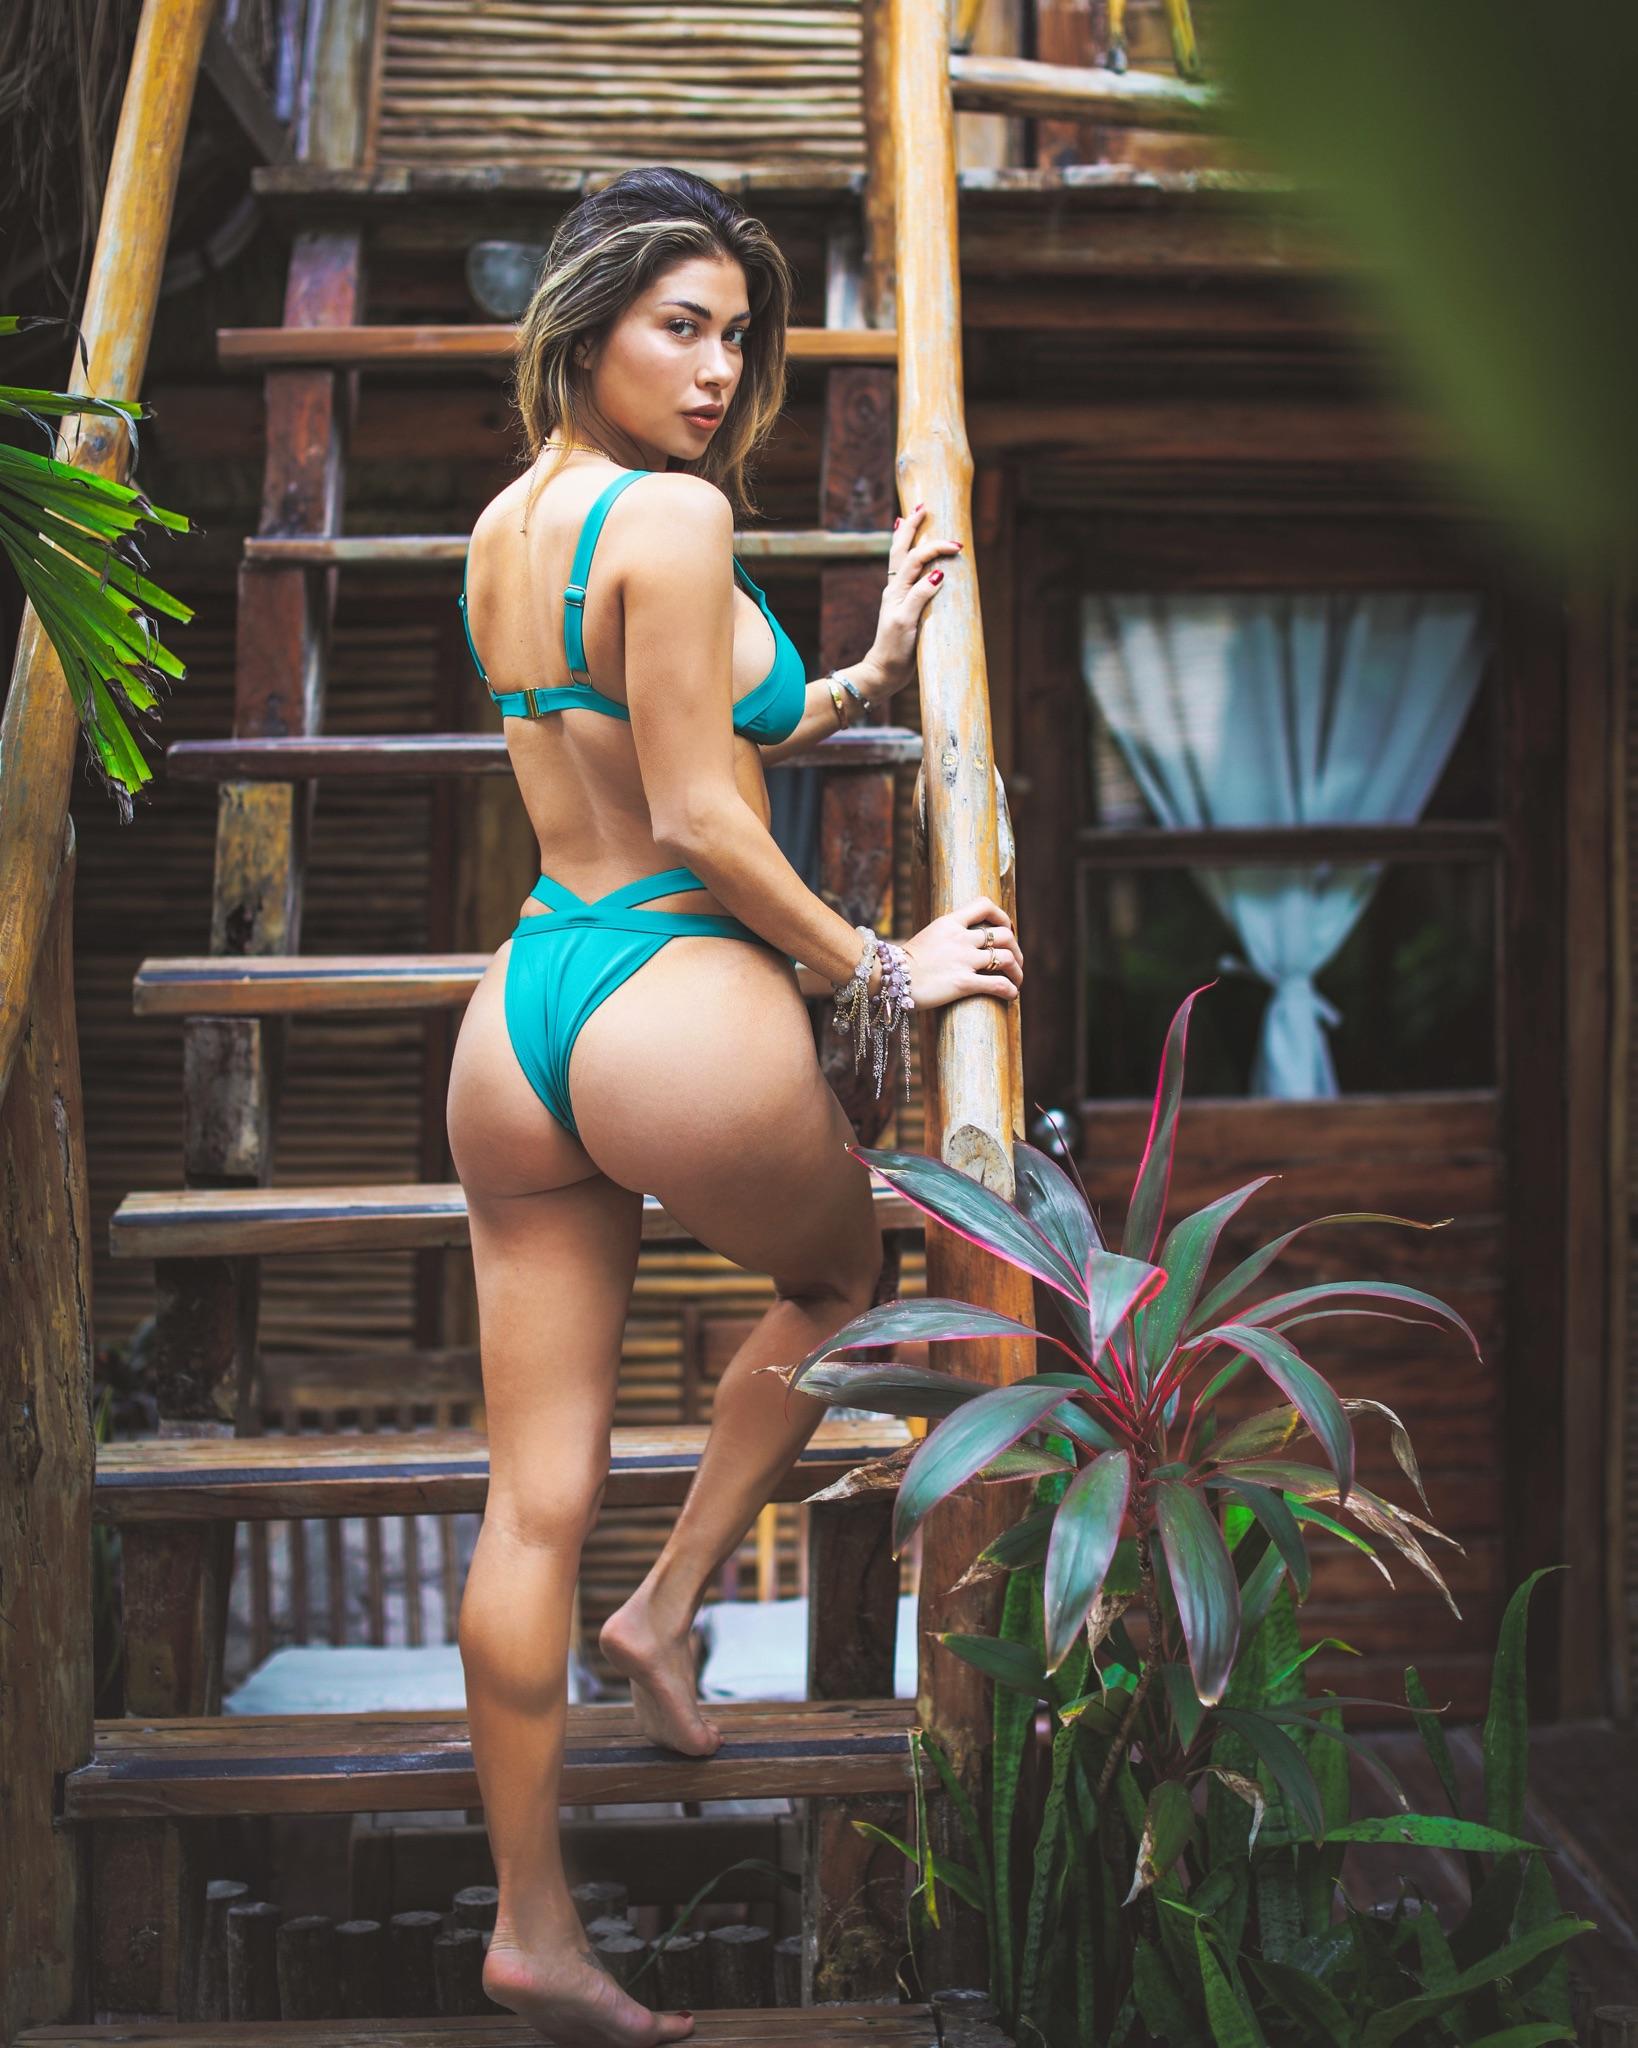 UFC Ring Girl Arianny Celeste Underwear And Bikini Photos